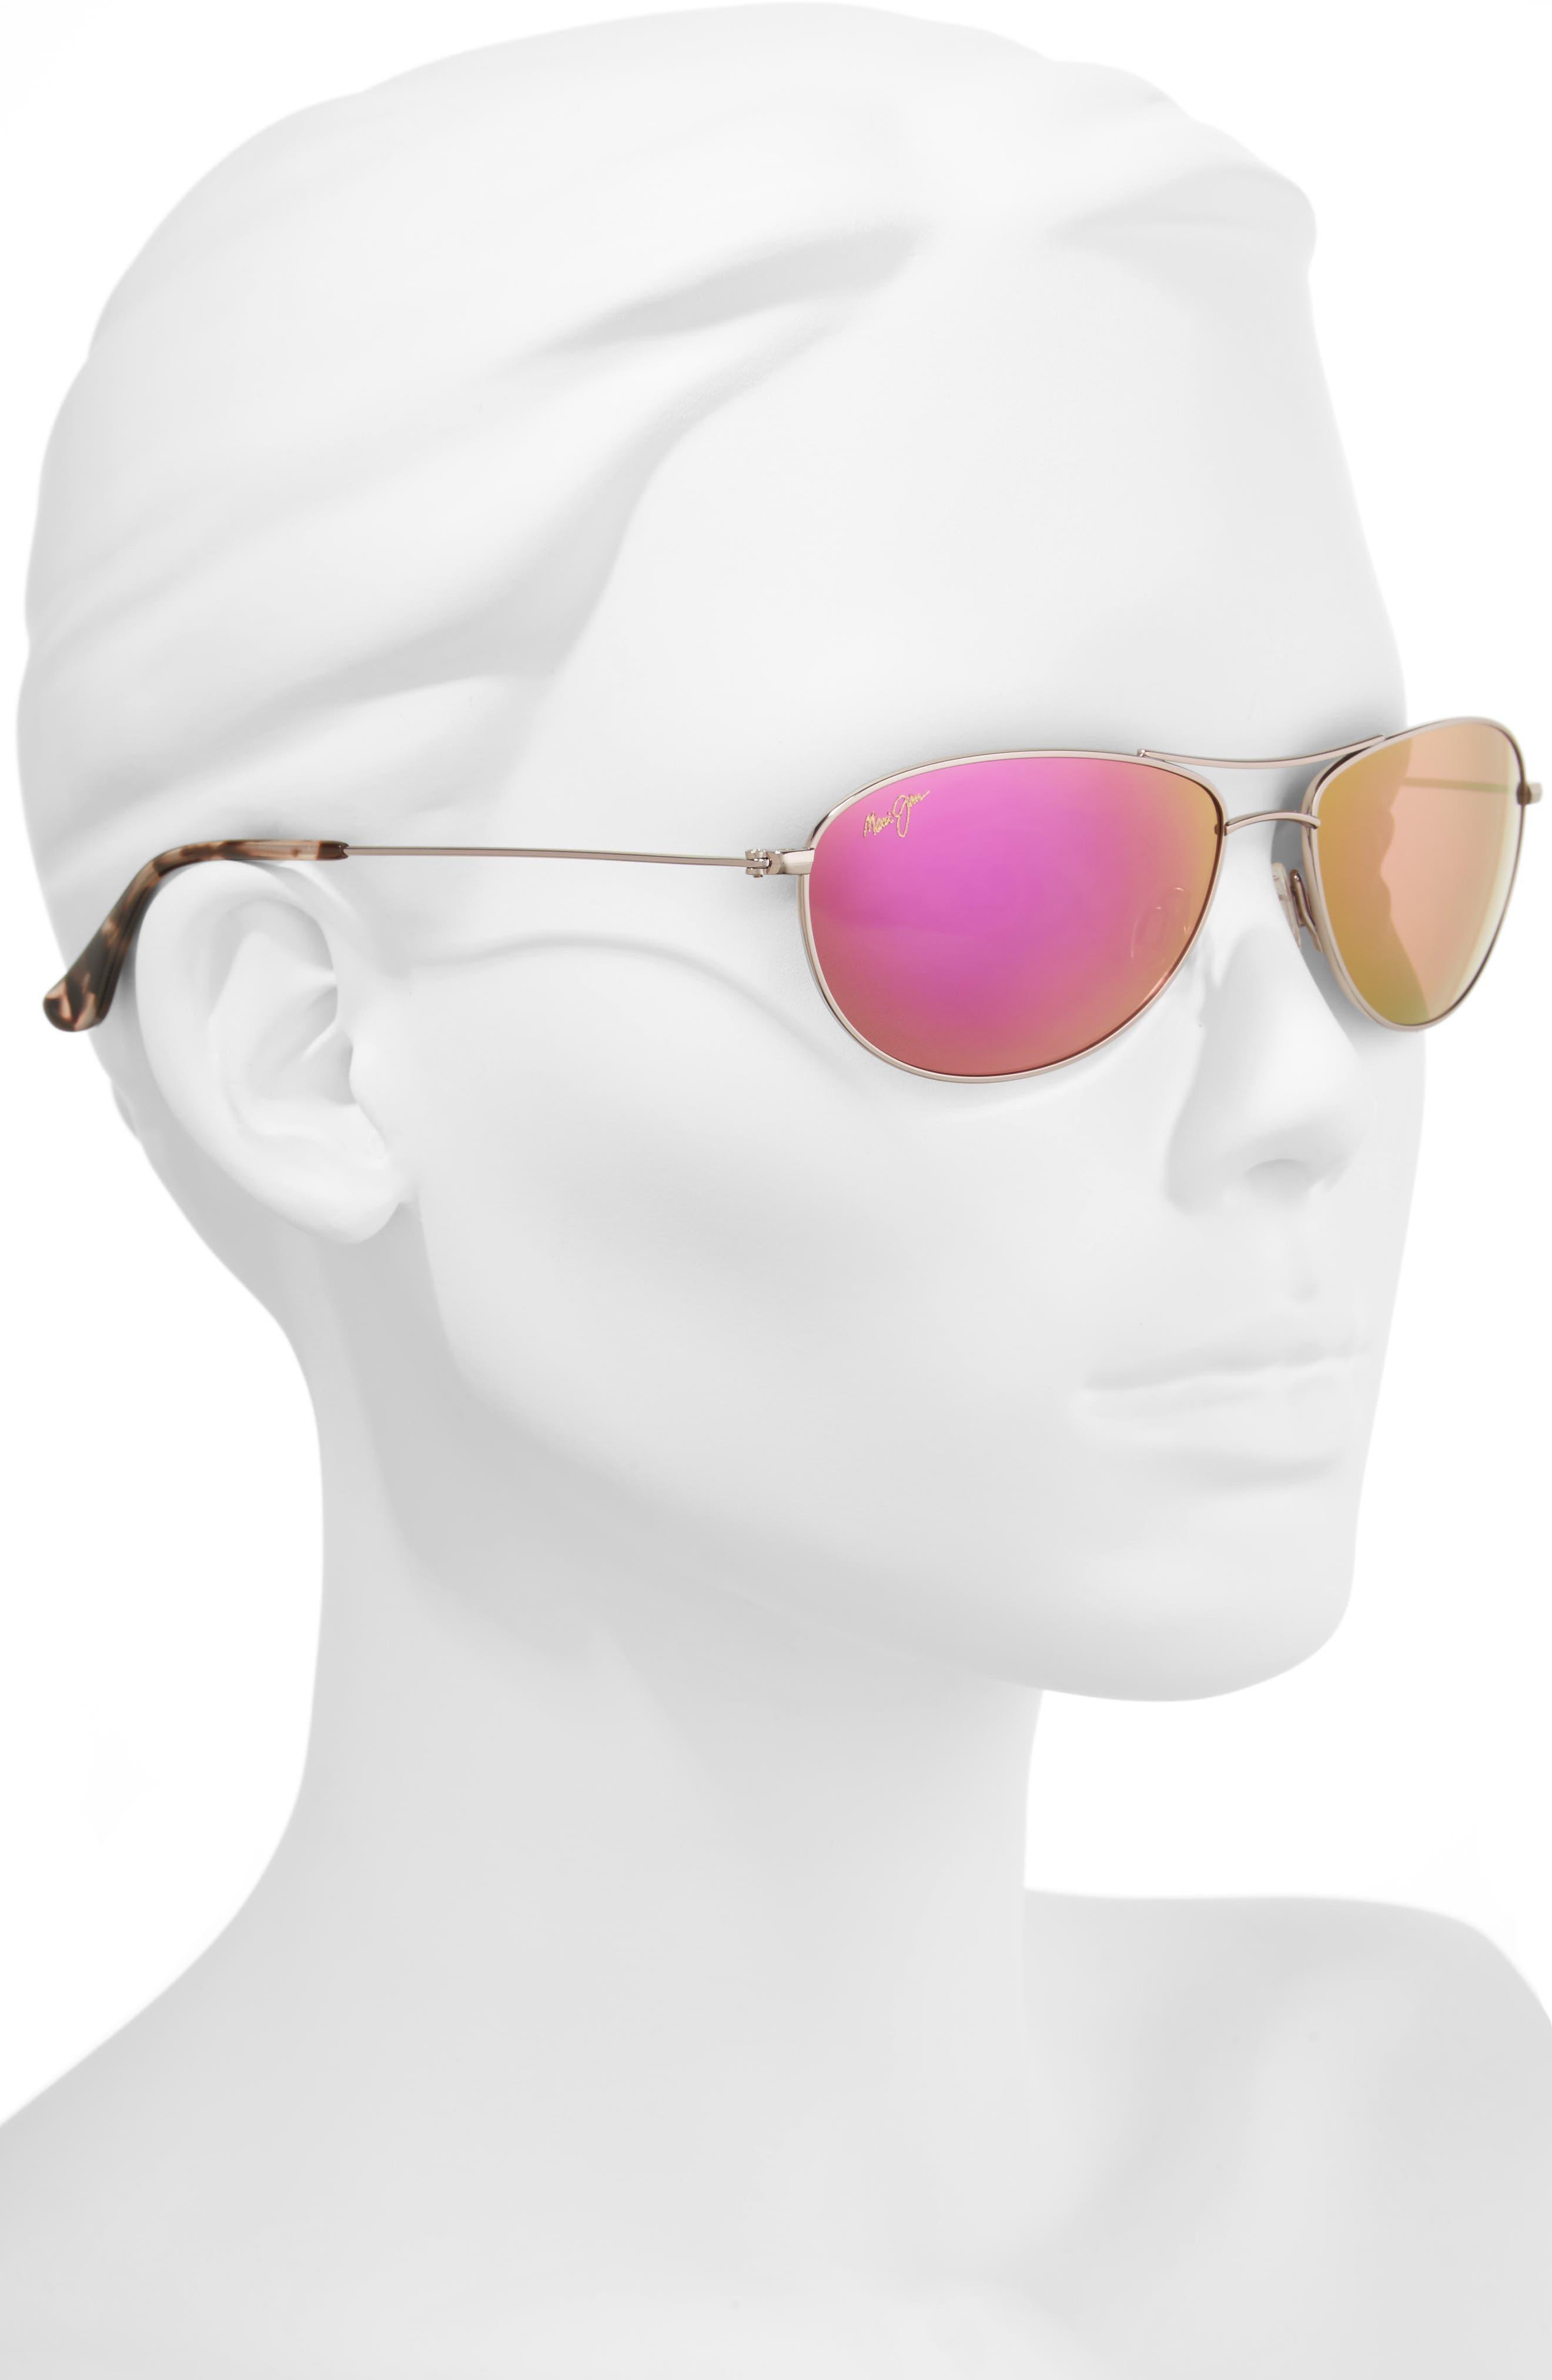 Baby Beach 56mm Mirrored PolarizedPlus2<sup>®</sup> Aviator Sunglasses,                             Alternate thumbnail 2, color,                             ROSE GOLD/ MAUI SUNRISE